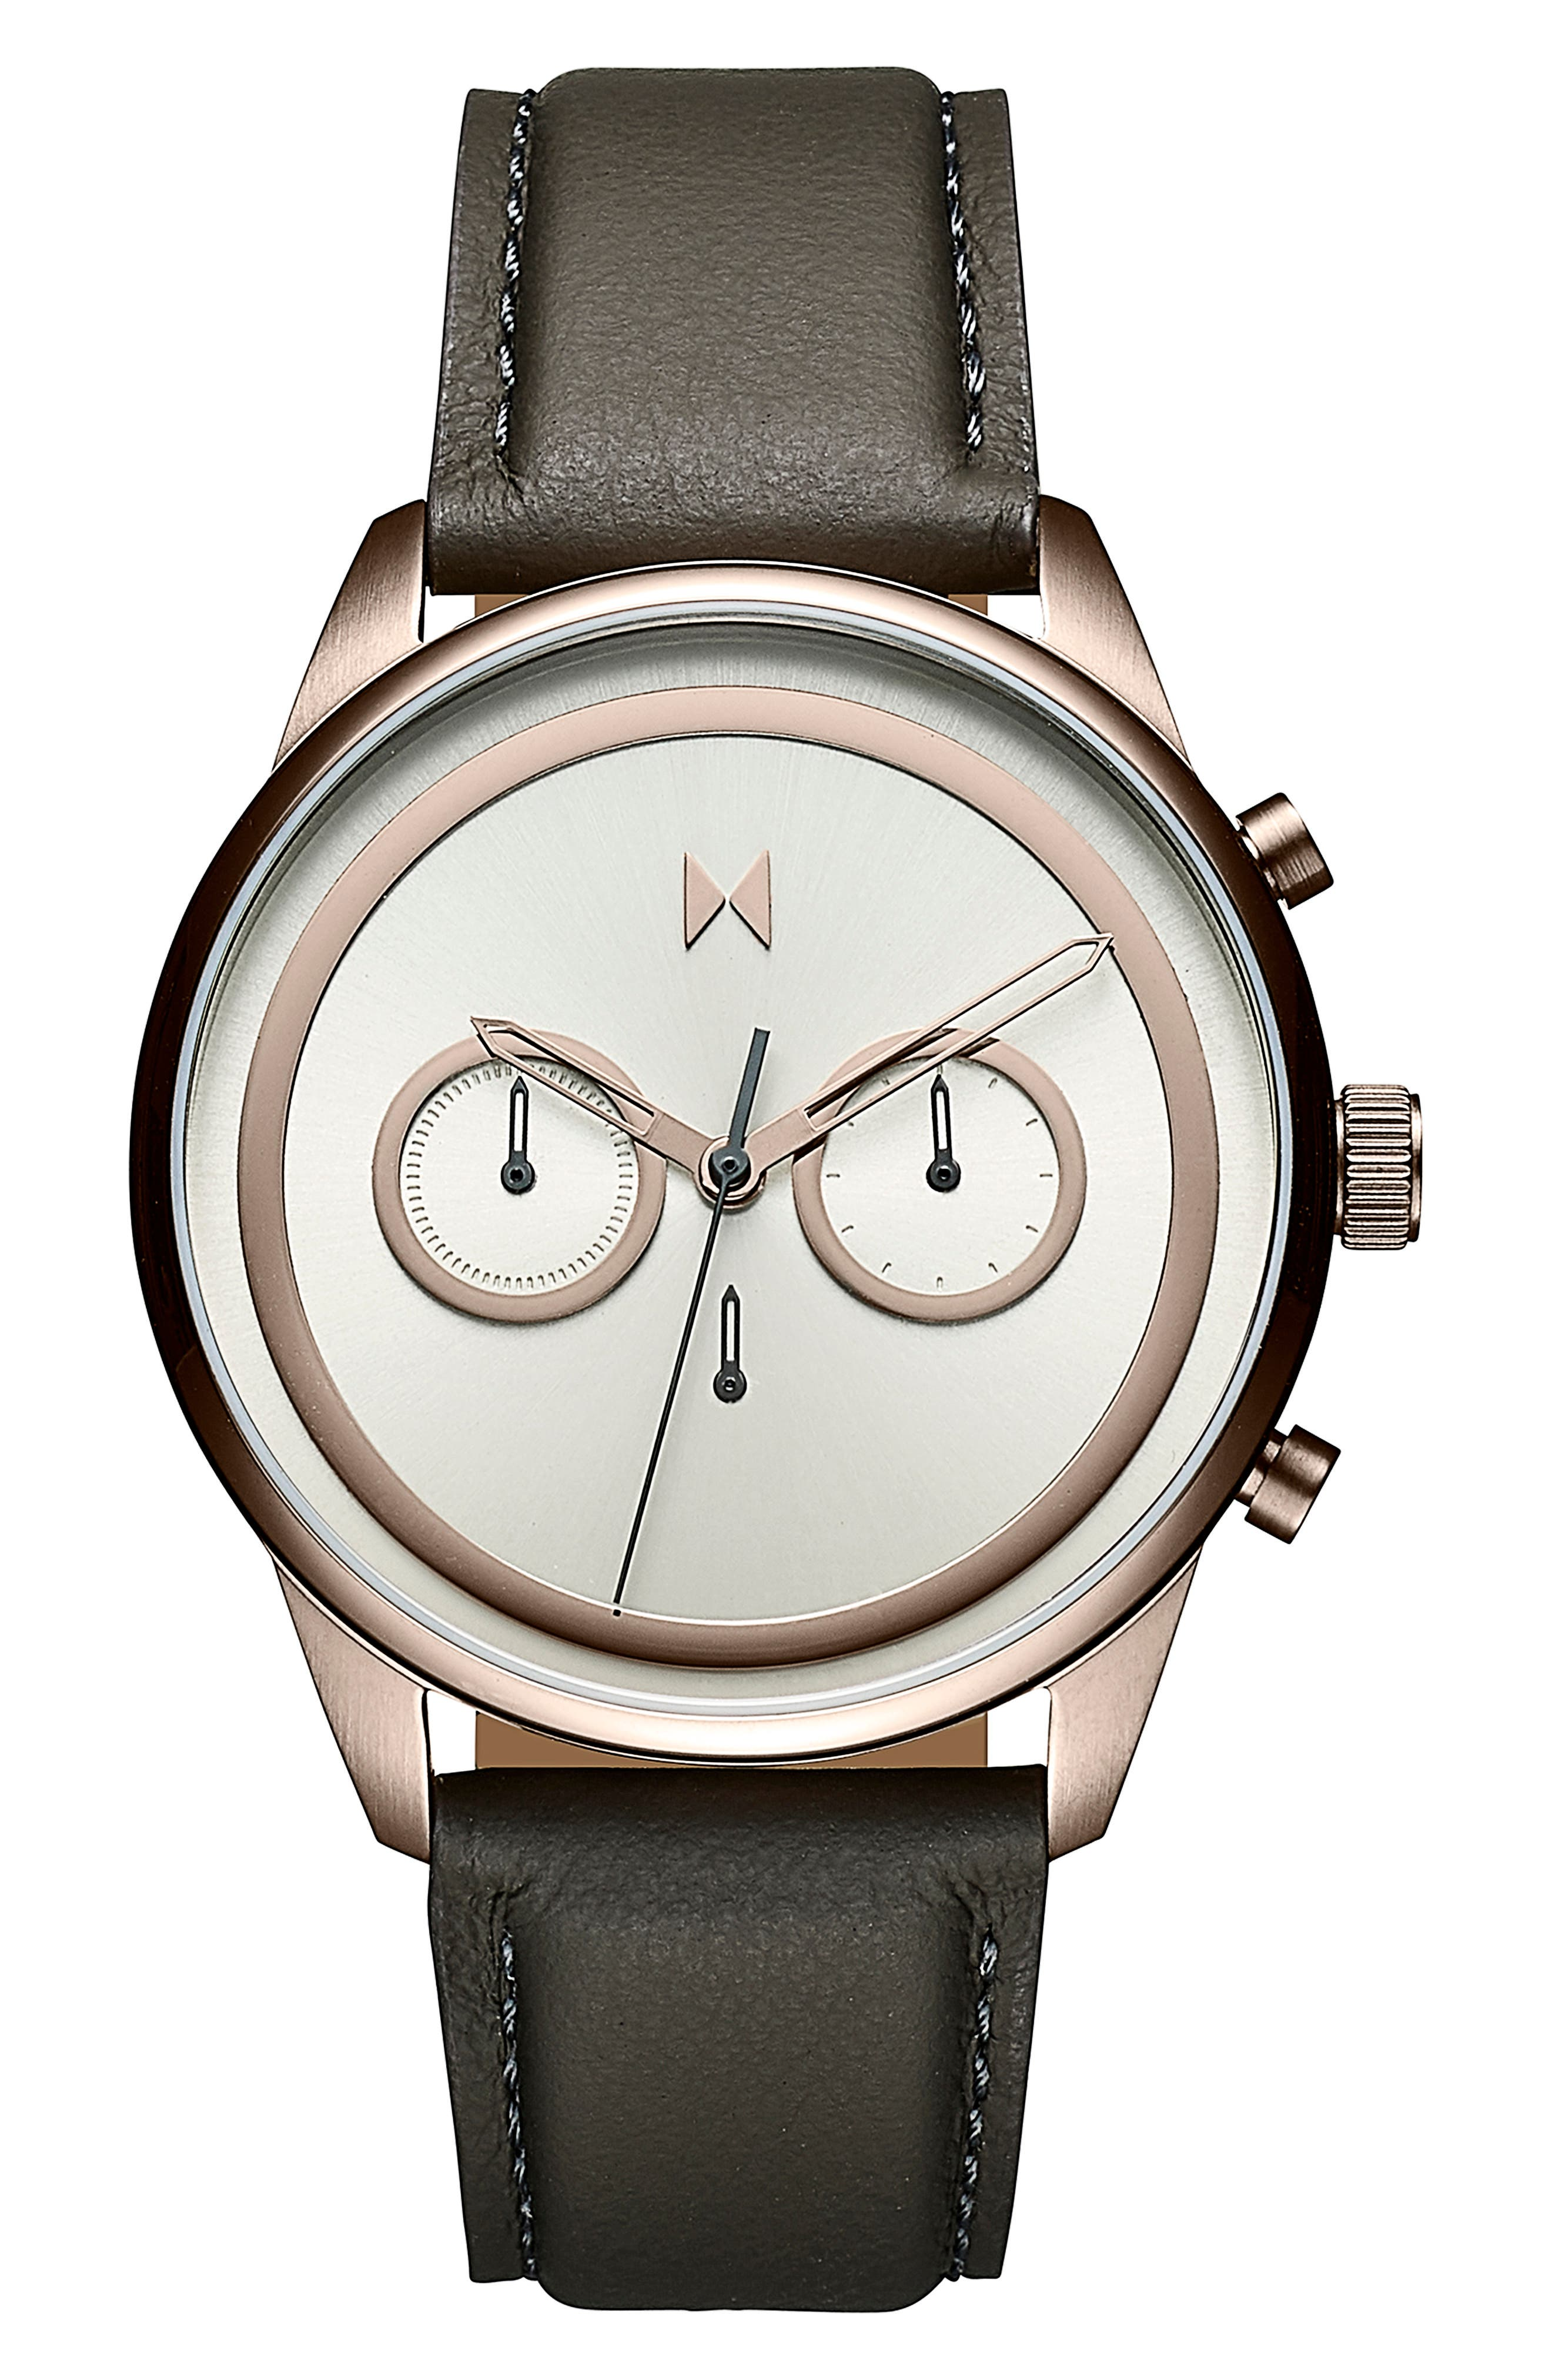 Powerlane Chronograph Leather Strap Watch